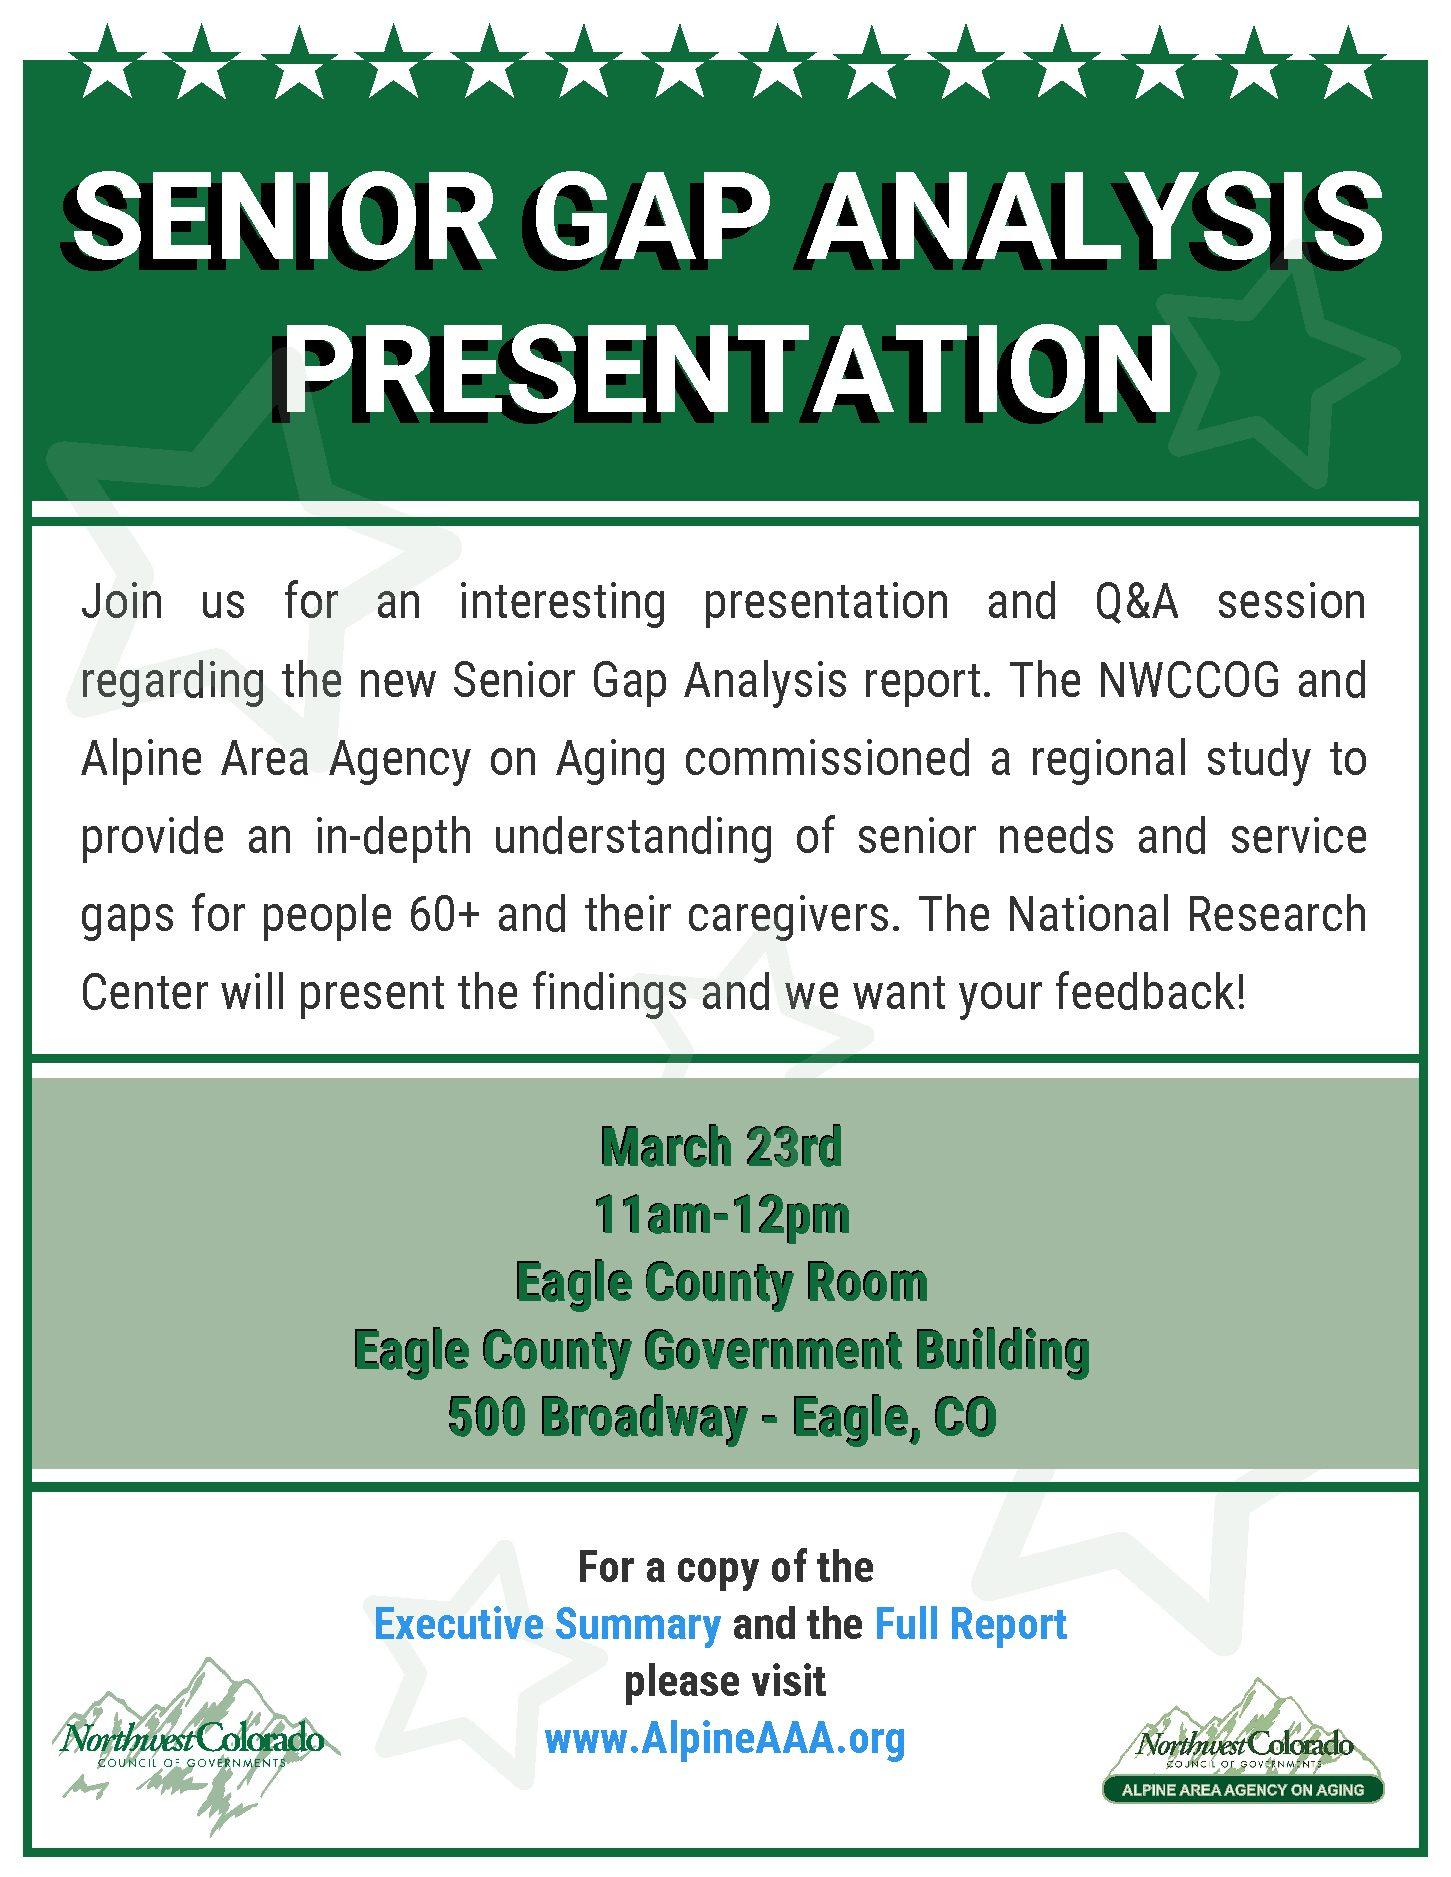 Senior Gap Analysis Presentation | Alpine Area Agency on Aging